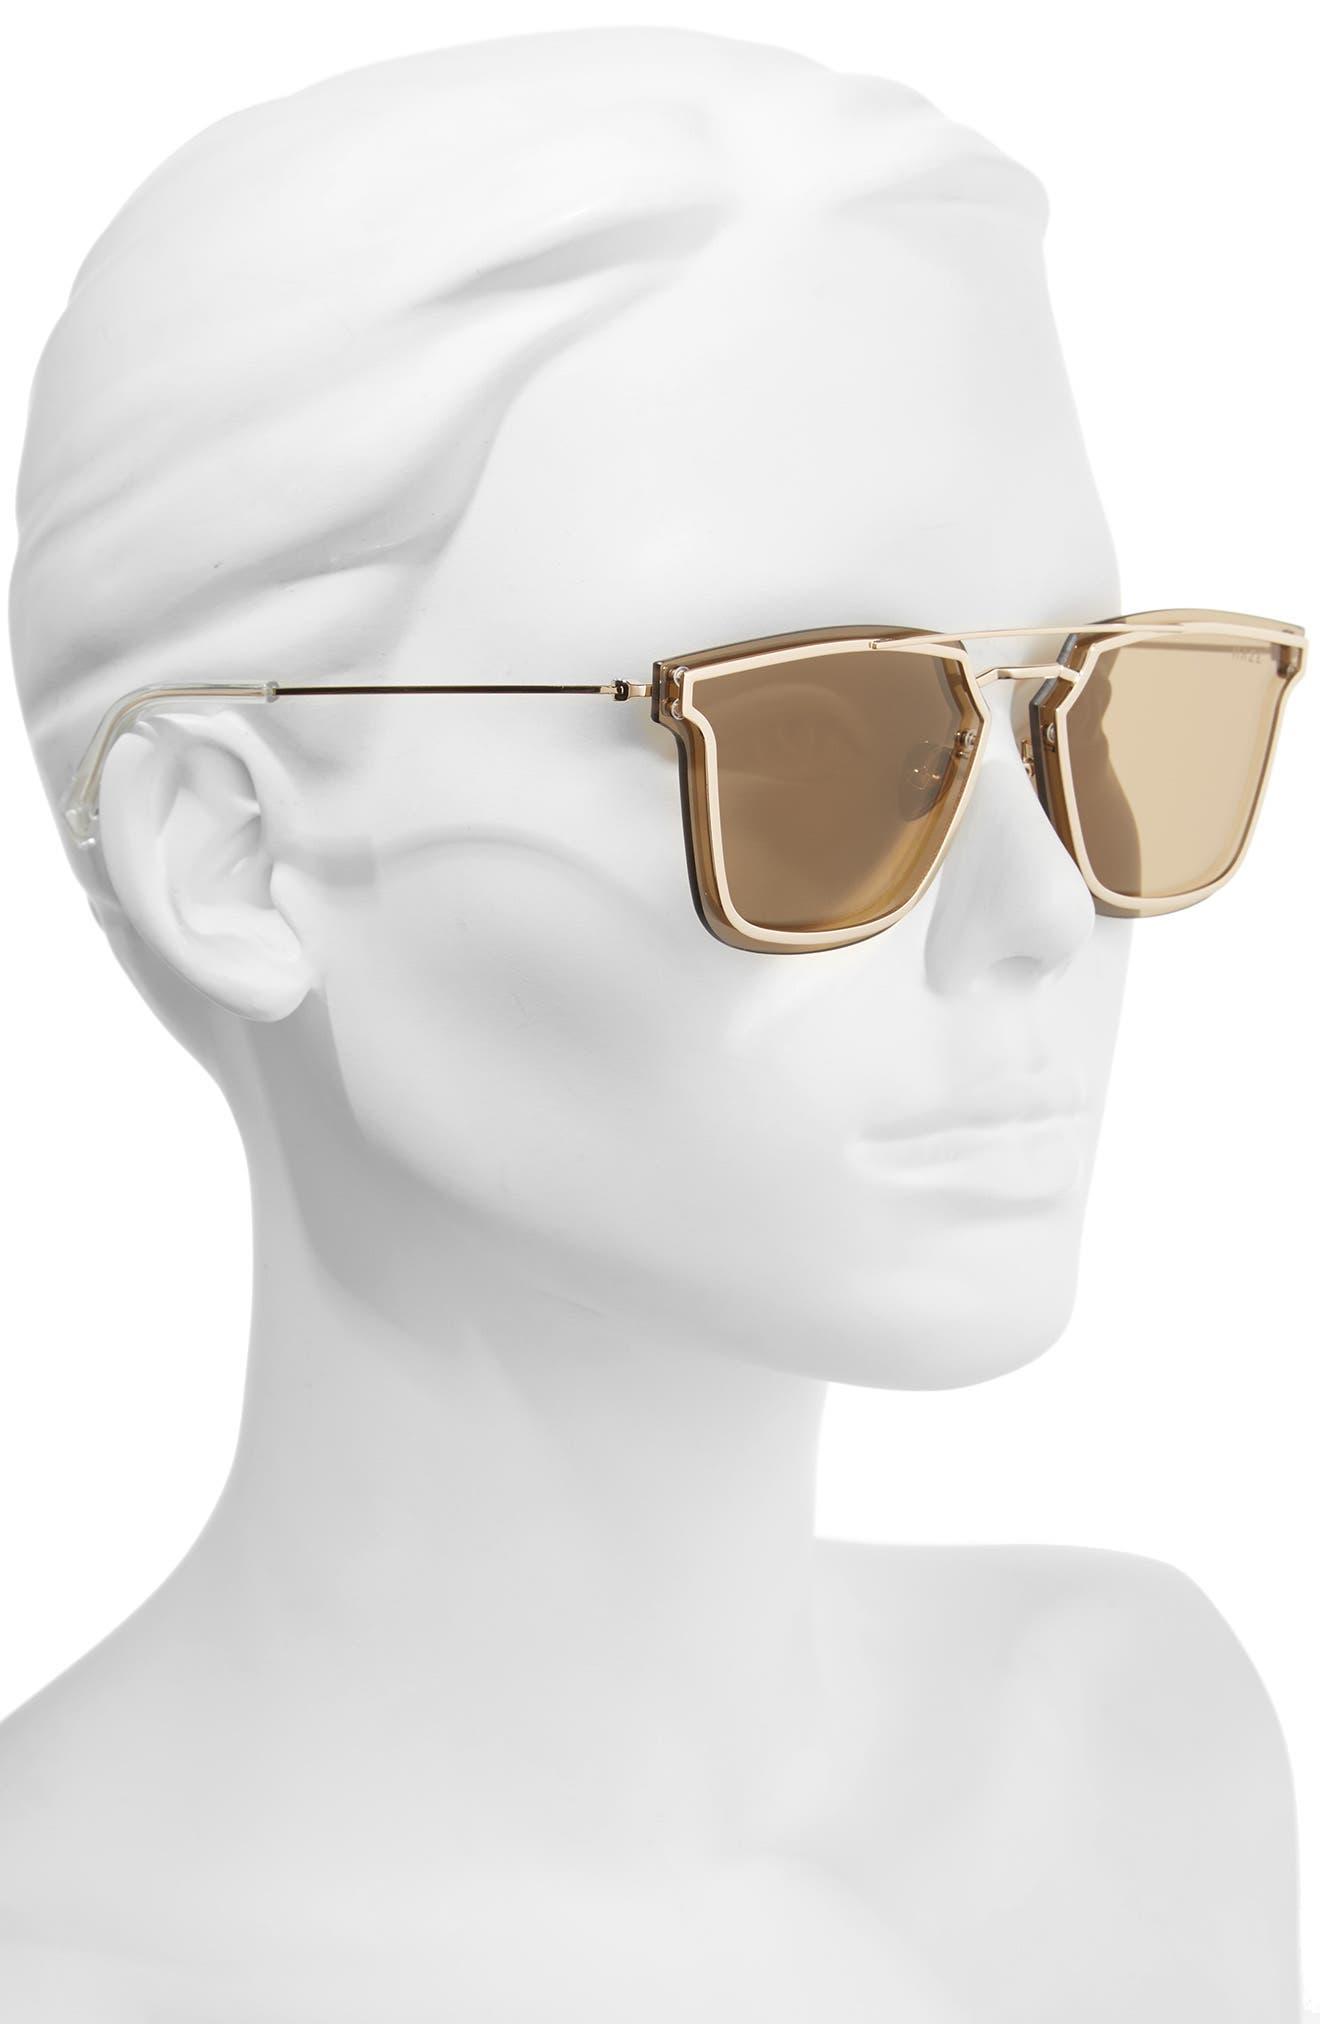 Alternate Image 2  - HAZE Bond 67mm Oversize Mirrored Sunglasses